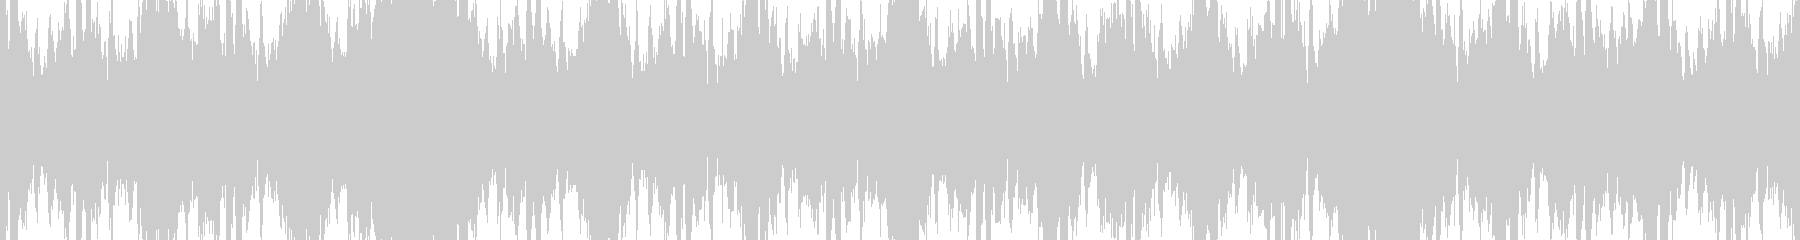 Tense battle orchestra loop material's unreproduced waveform